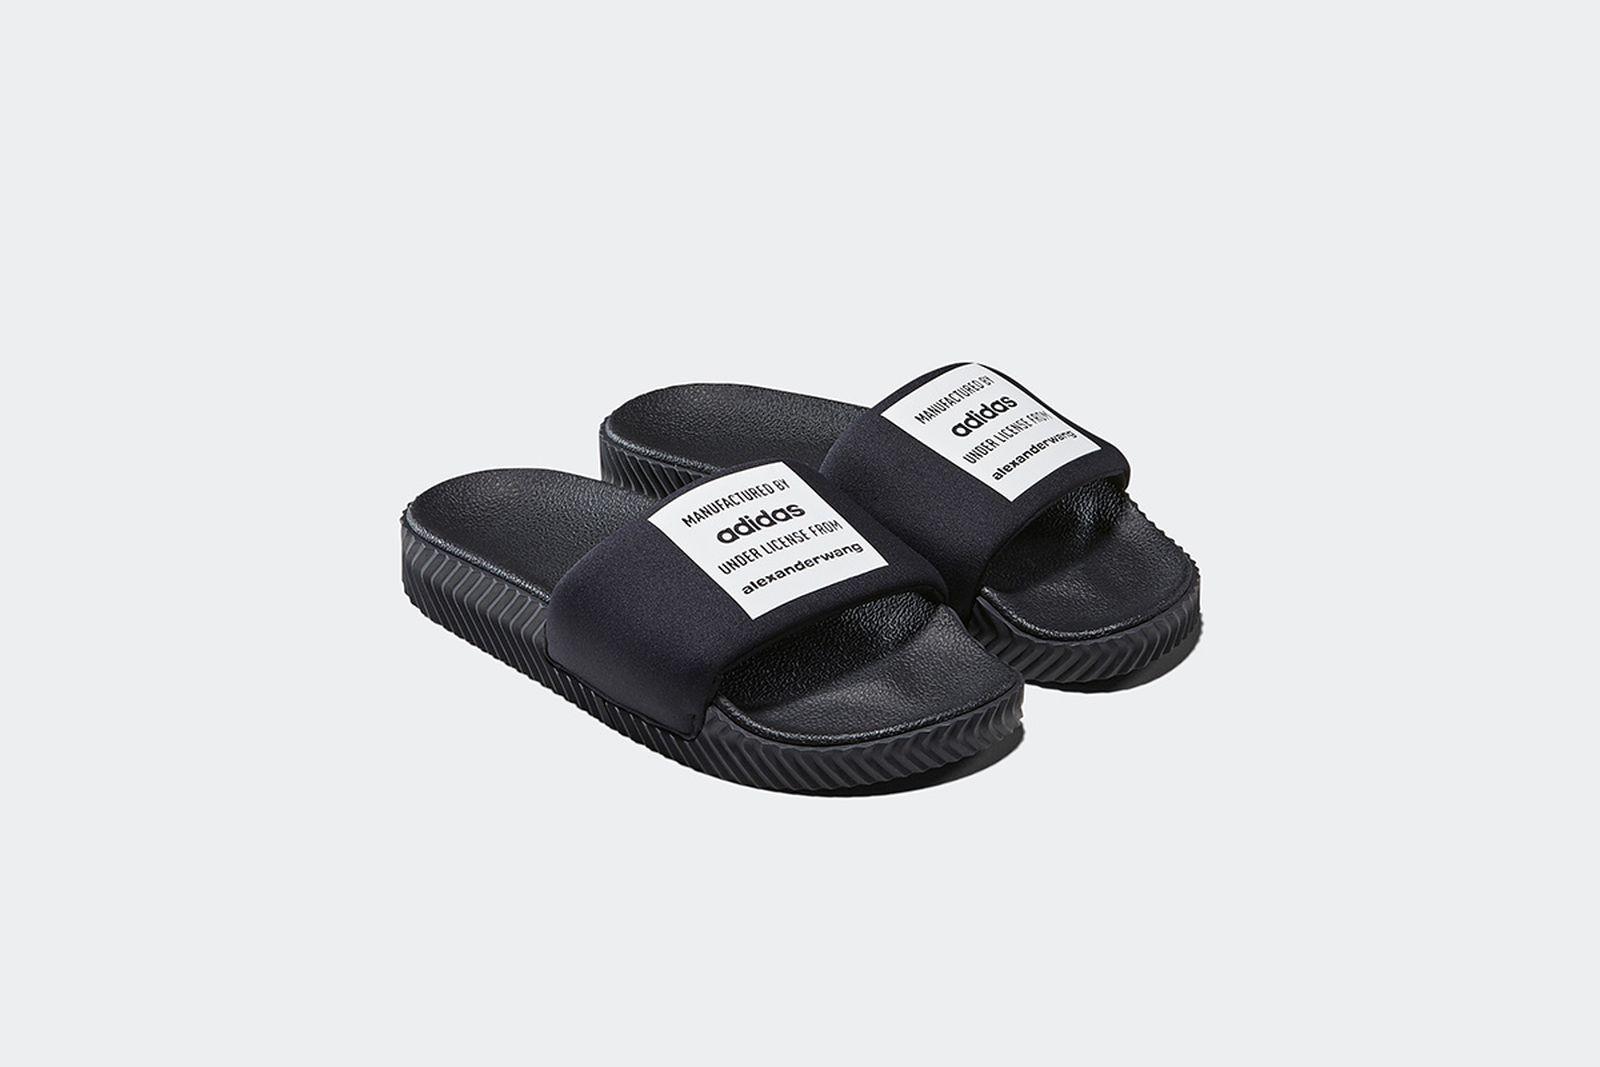 adidas originals by alexander wang season 5 drop 2